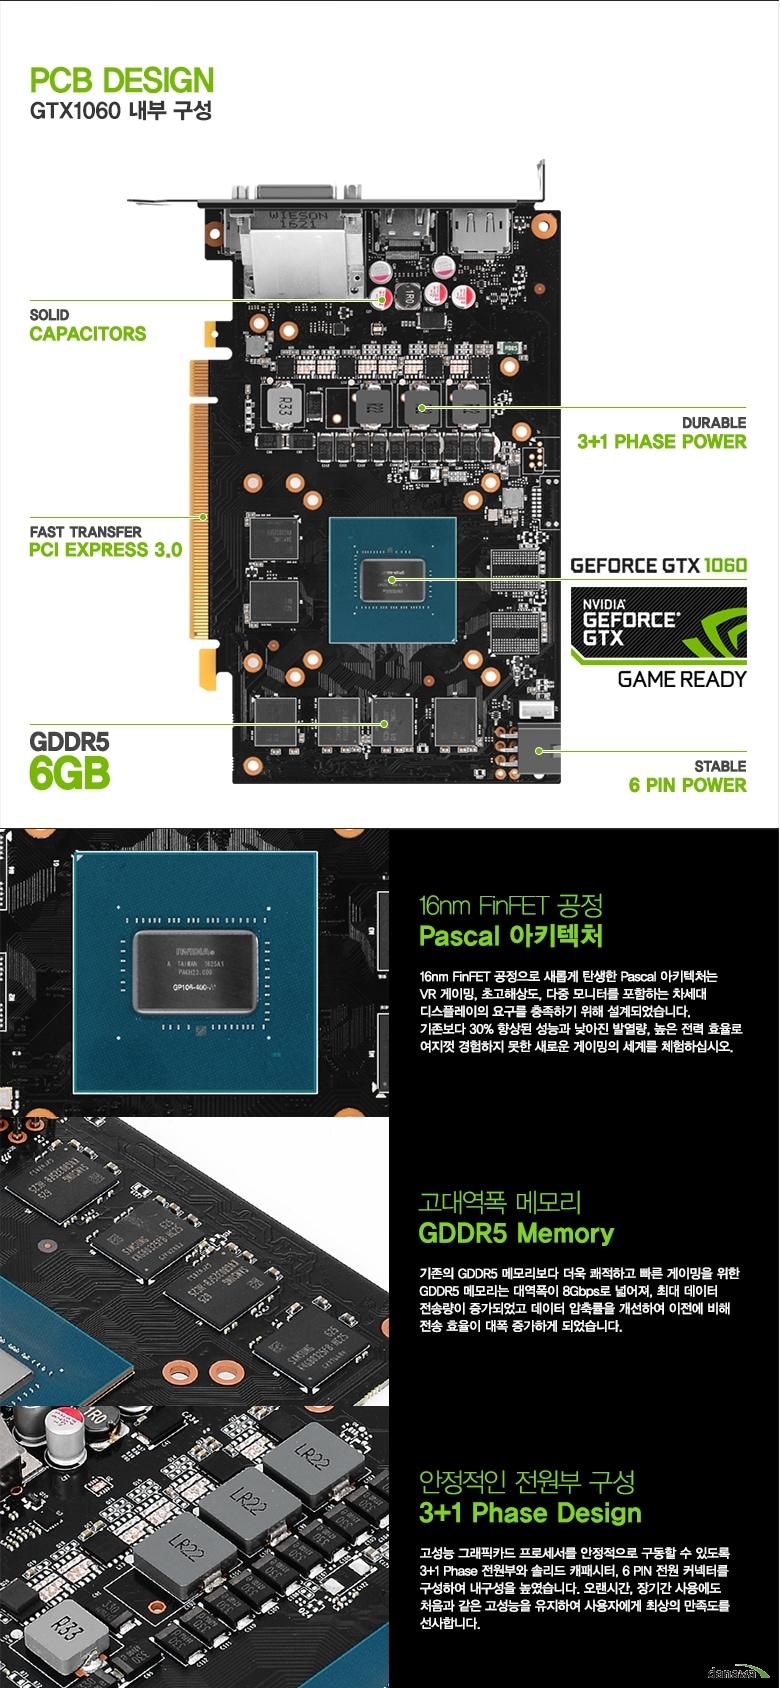 GTX1060 내부 구성 솔리드 캐패시터, 페스트 트렌스퍼 PCI 익스프레스 3.0, GDDR5 6GB, 듀러블 3+1 페이즈 파워, 지포스 GTX 1060 게임 레디, 스테이블 6 핀 파워    16nm 핀셋 공정 파스칼 아키텍처 16nm 핀셋 공정으로 새롭게 탄생한 파스칼 아키텍처는 VR게이밍, 초고해상도, 다중 모니터를 포함하는 차세대 디스플레이의 요구를 충족하기 위해 설계되었습니다. 기존보다 30% 향상된 성능과 낮아진 발열량, 높은 전력 효율로 여지껏 경험하지 못한 새로운 게이밍의 세계를 체험하십시오.   고대역폭 메모리 GGDR5 맴ㅎ라 기존의 GDDR5 메모리보다 더욱 쾌적하고 빠른 게이밍을 위한 GDDR5 메모리는 대역폭이 8Gbps로 넓어져, 최대 데이터 전송량이 증가되었고 데이터 압축률을 개선하여 이전에 비해 전송 효율이 대폭 증가하게 되었습니다. 안정적인 전원부 구성 3+1 Phase Design 고성능 그래픽카드 프로세서를 안정적으로 구동할 수 있도록 3+1 페이즈 전원부와 솔리드 캐패시터, 6 핀 전원 커넥터를 구성하여 내구성을 높였습니다. 오랜시간, 장기간 사용에도 처음과 같은 고성능을 유지하여 사용자에게 최상의 만족도를 선사합니다.